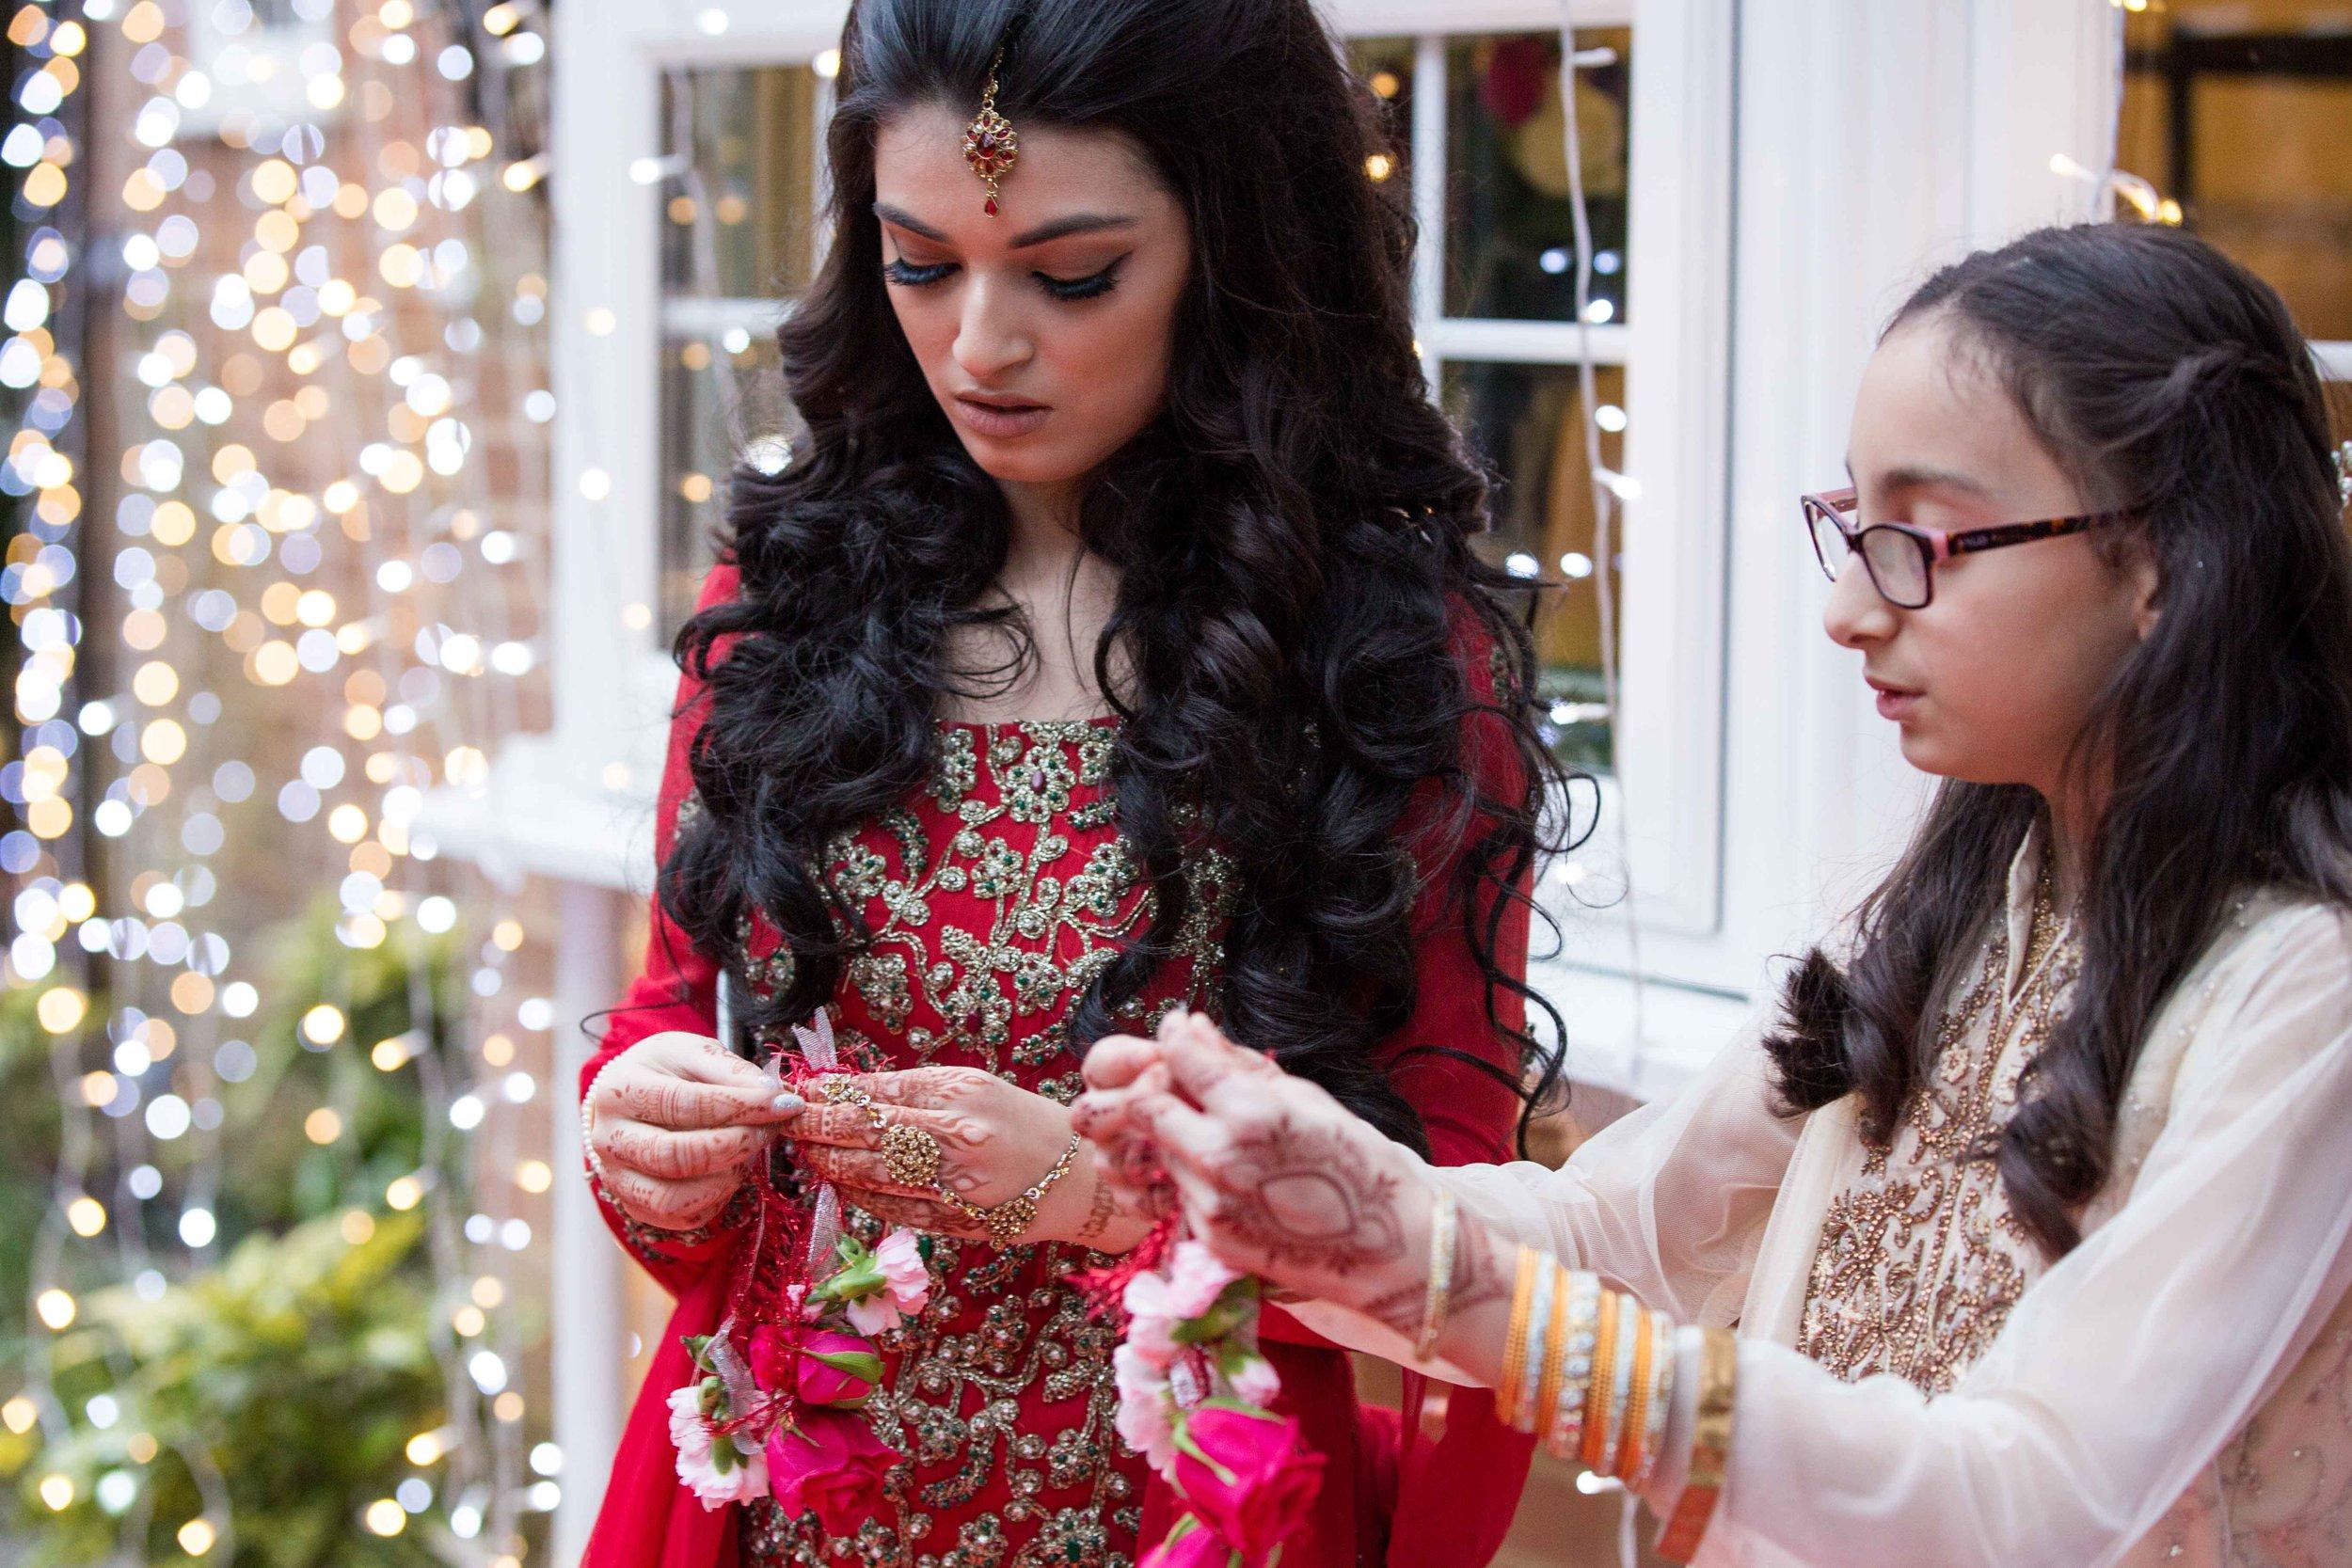 Macdonald-Berystede-Hotel-wedding-female-asian-wedding-photographer-london-natalia-smith-photography-33.jpg